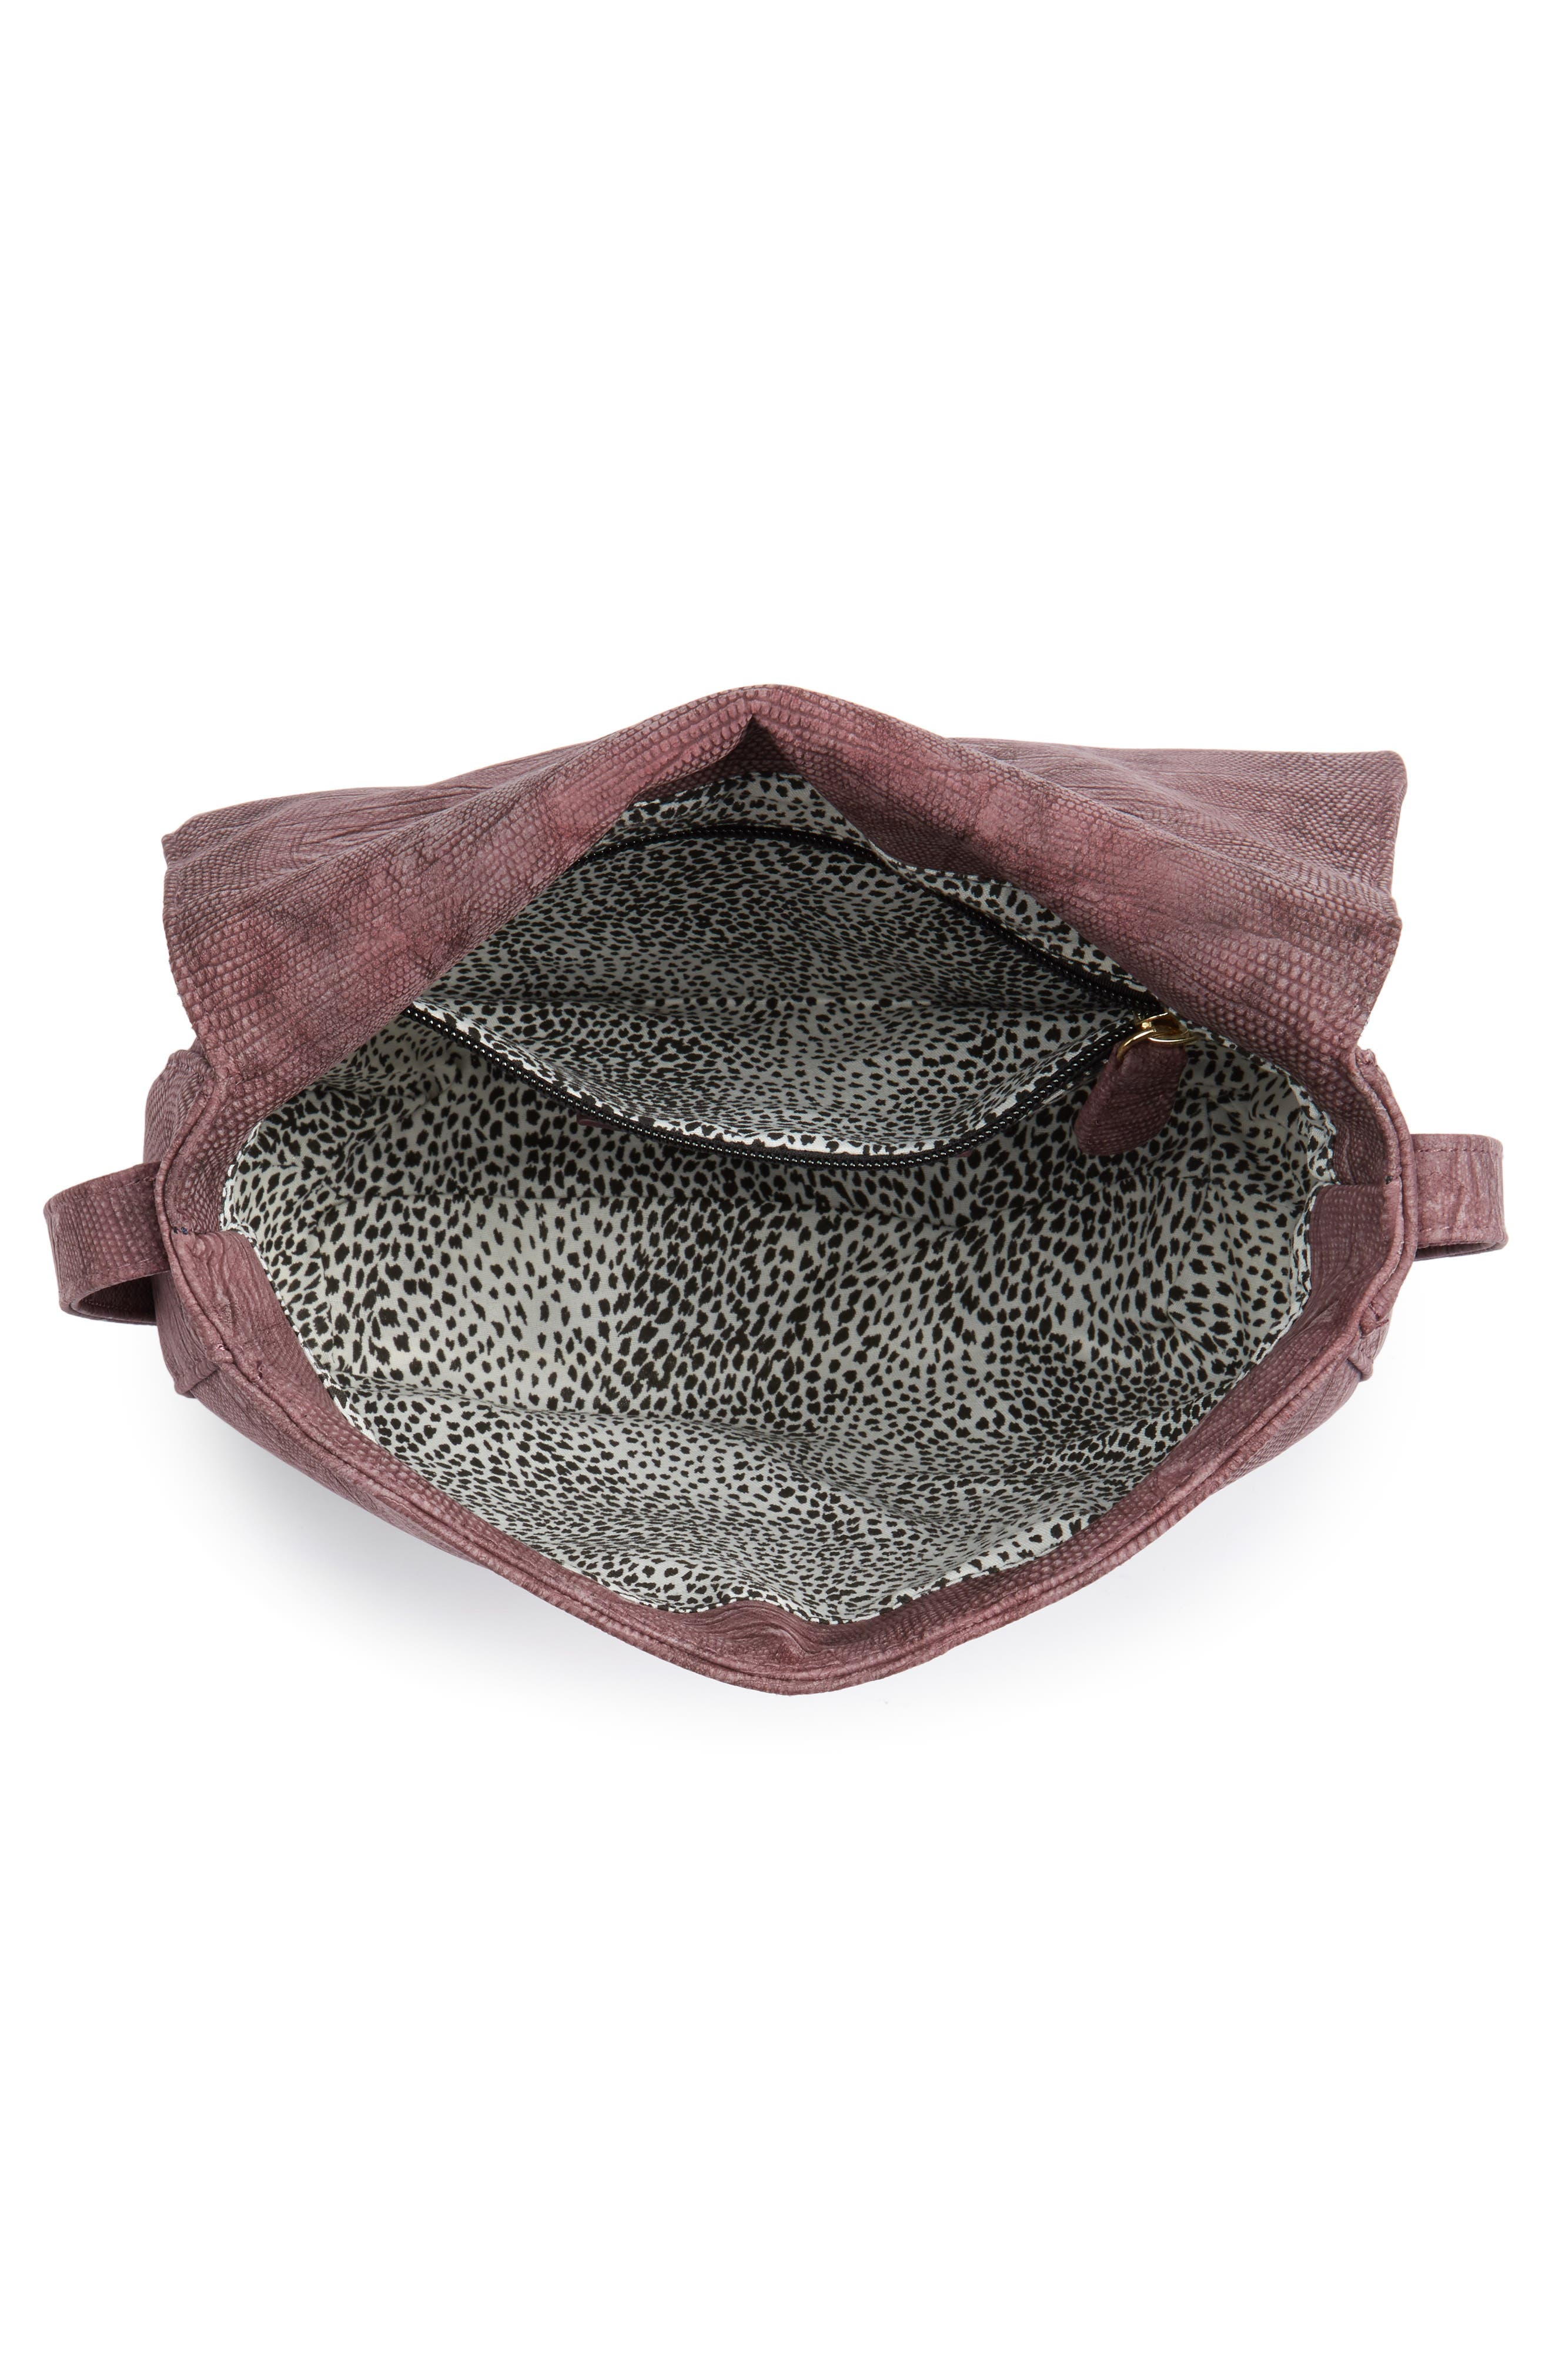 Livvy Faux Leather Crossbody Saddle Bag,                             Alternate thumbnail 4, color,                             Oxblood